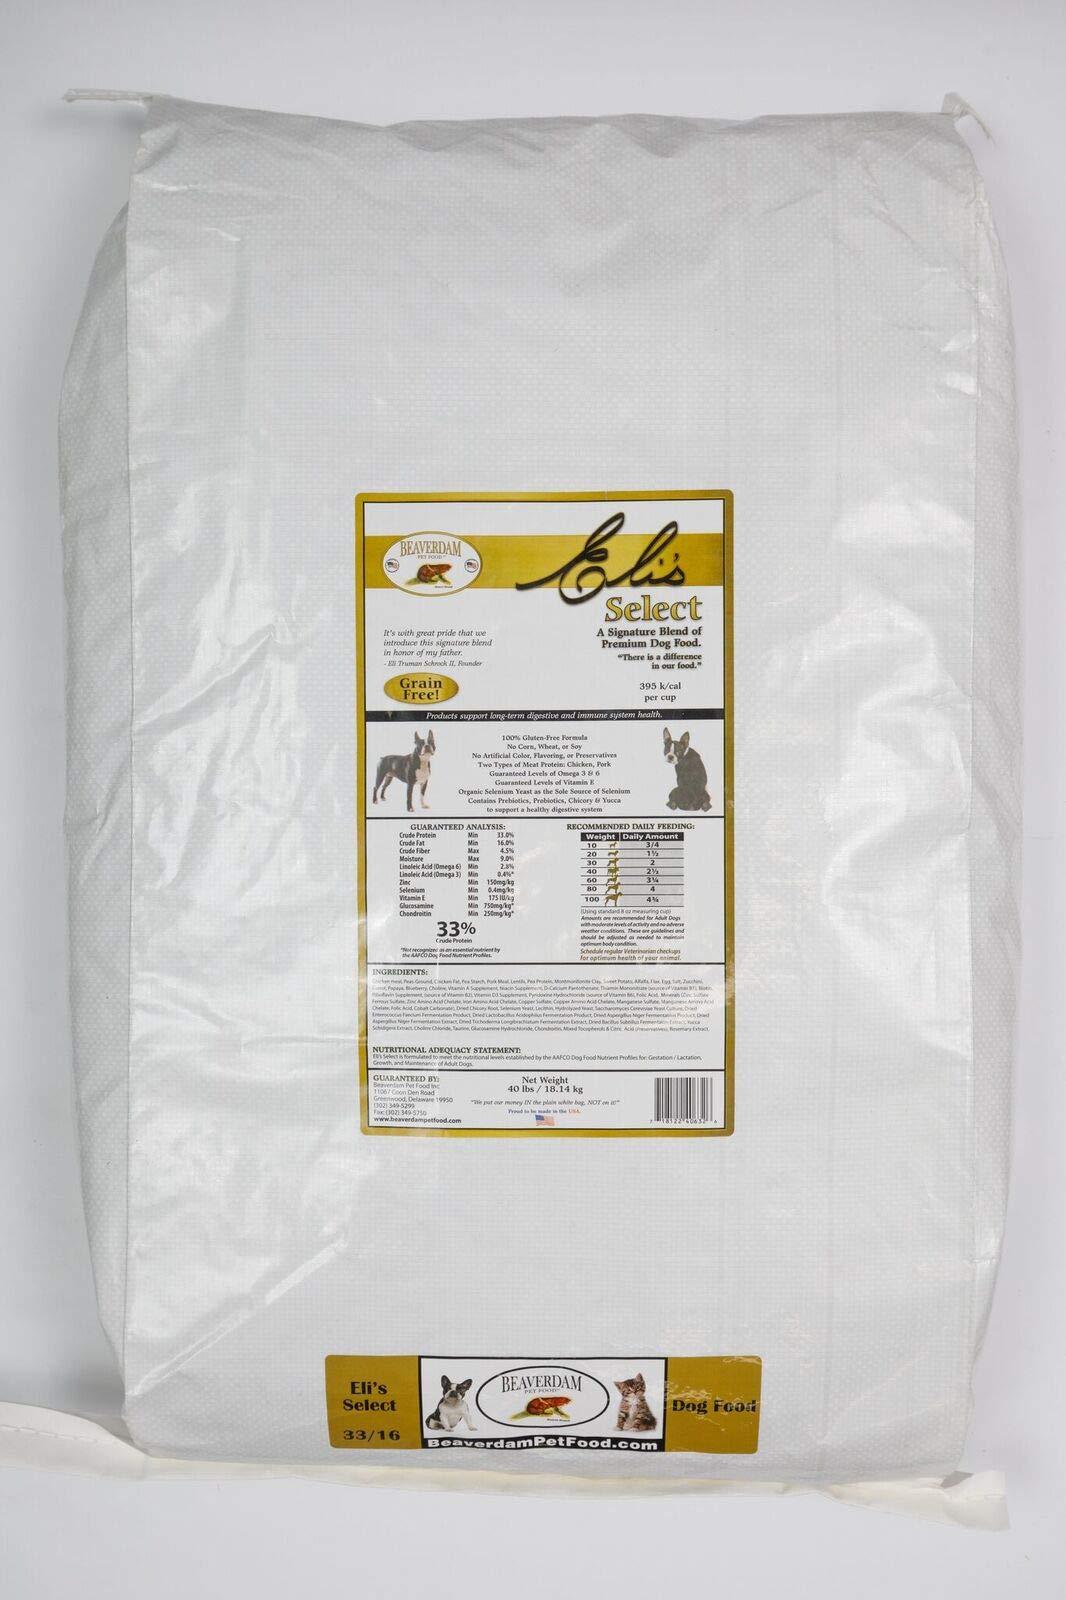 Beaverdam Pet Food, Inc. Eli's Select Grain Free 40 lb by Beaverdam Pet Food, Inc.